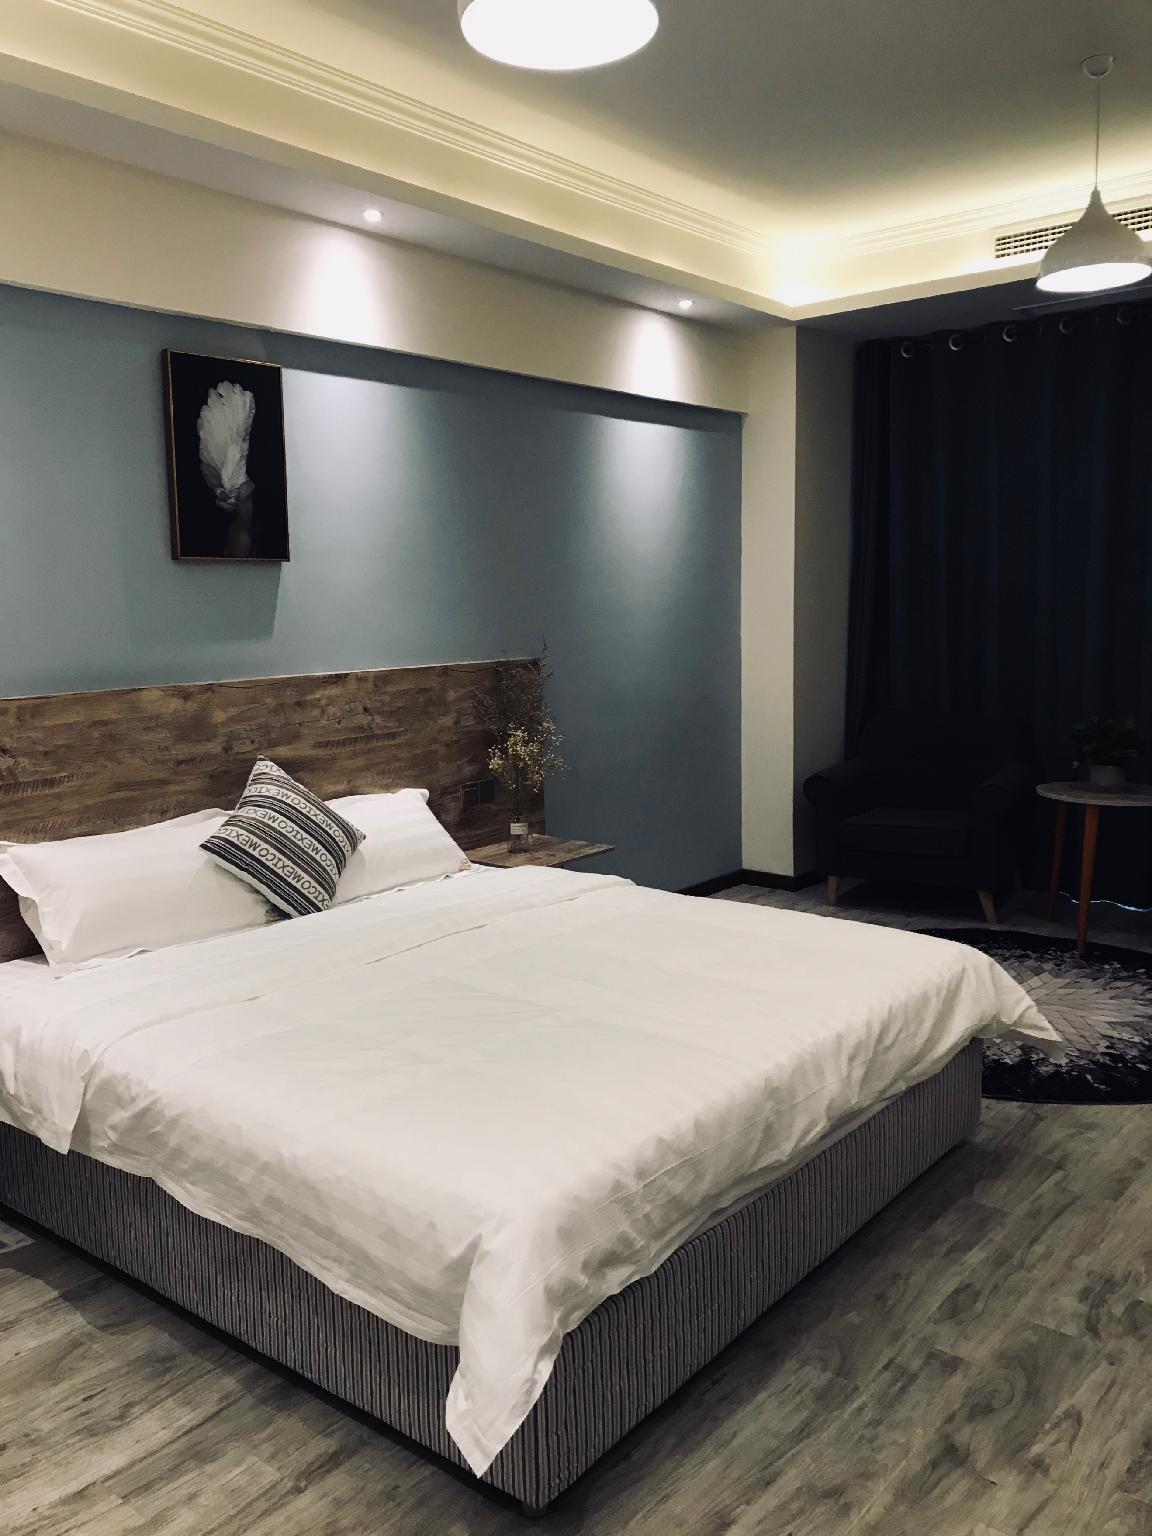 3amigos Deluxe double beds – Review, Photos, Price & Deals